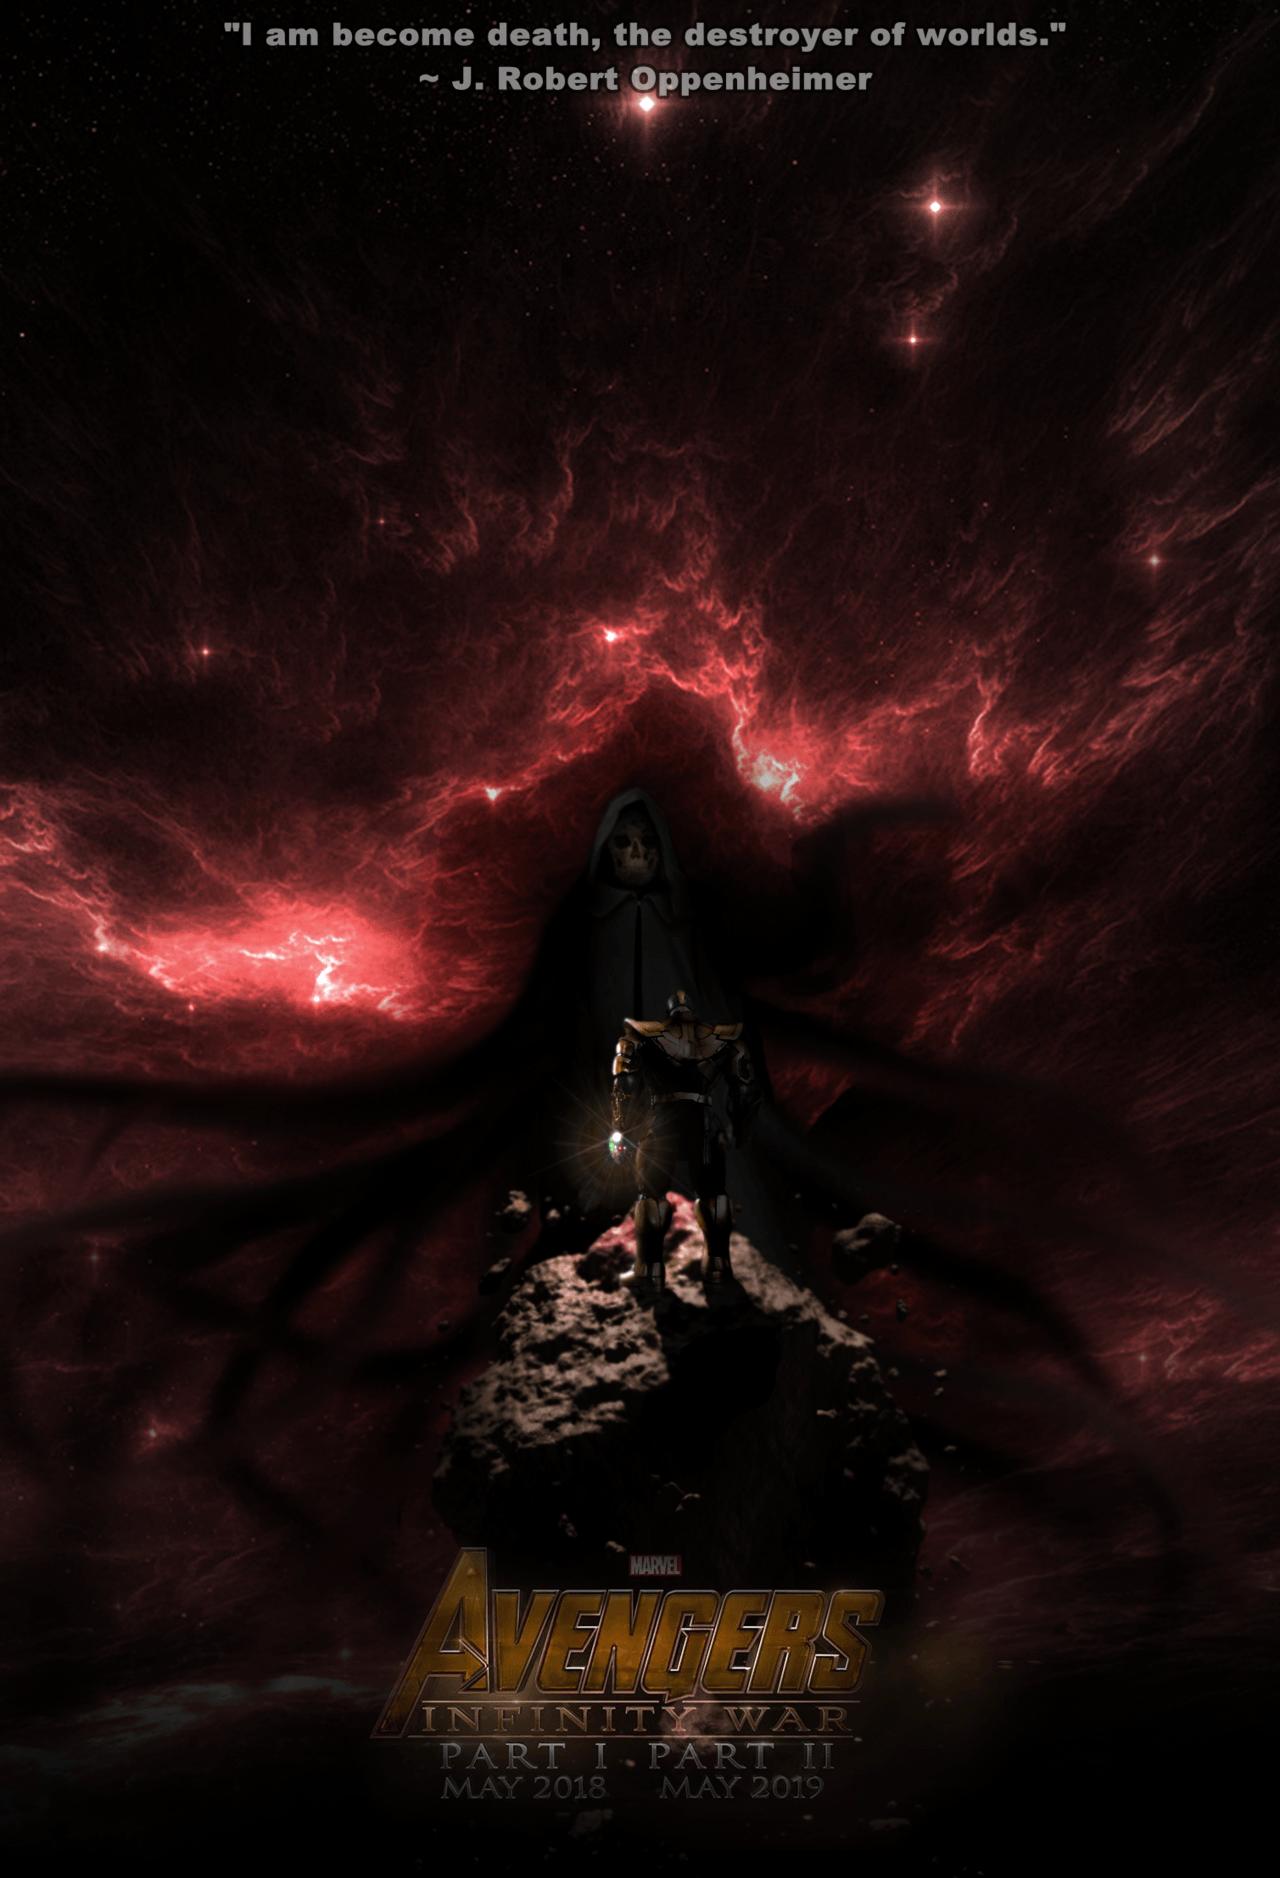 Avengers: Infinity War Wallpapers - Wallpaper Cave